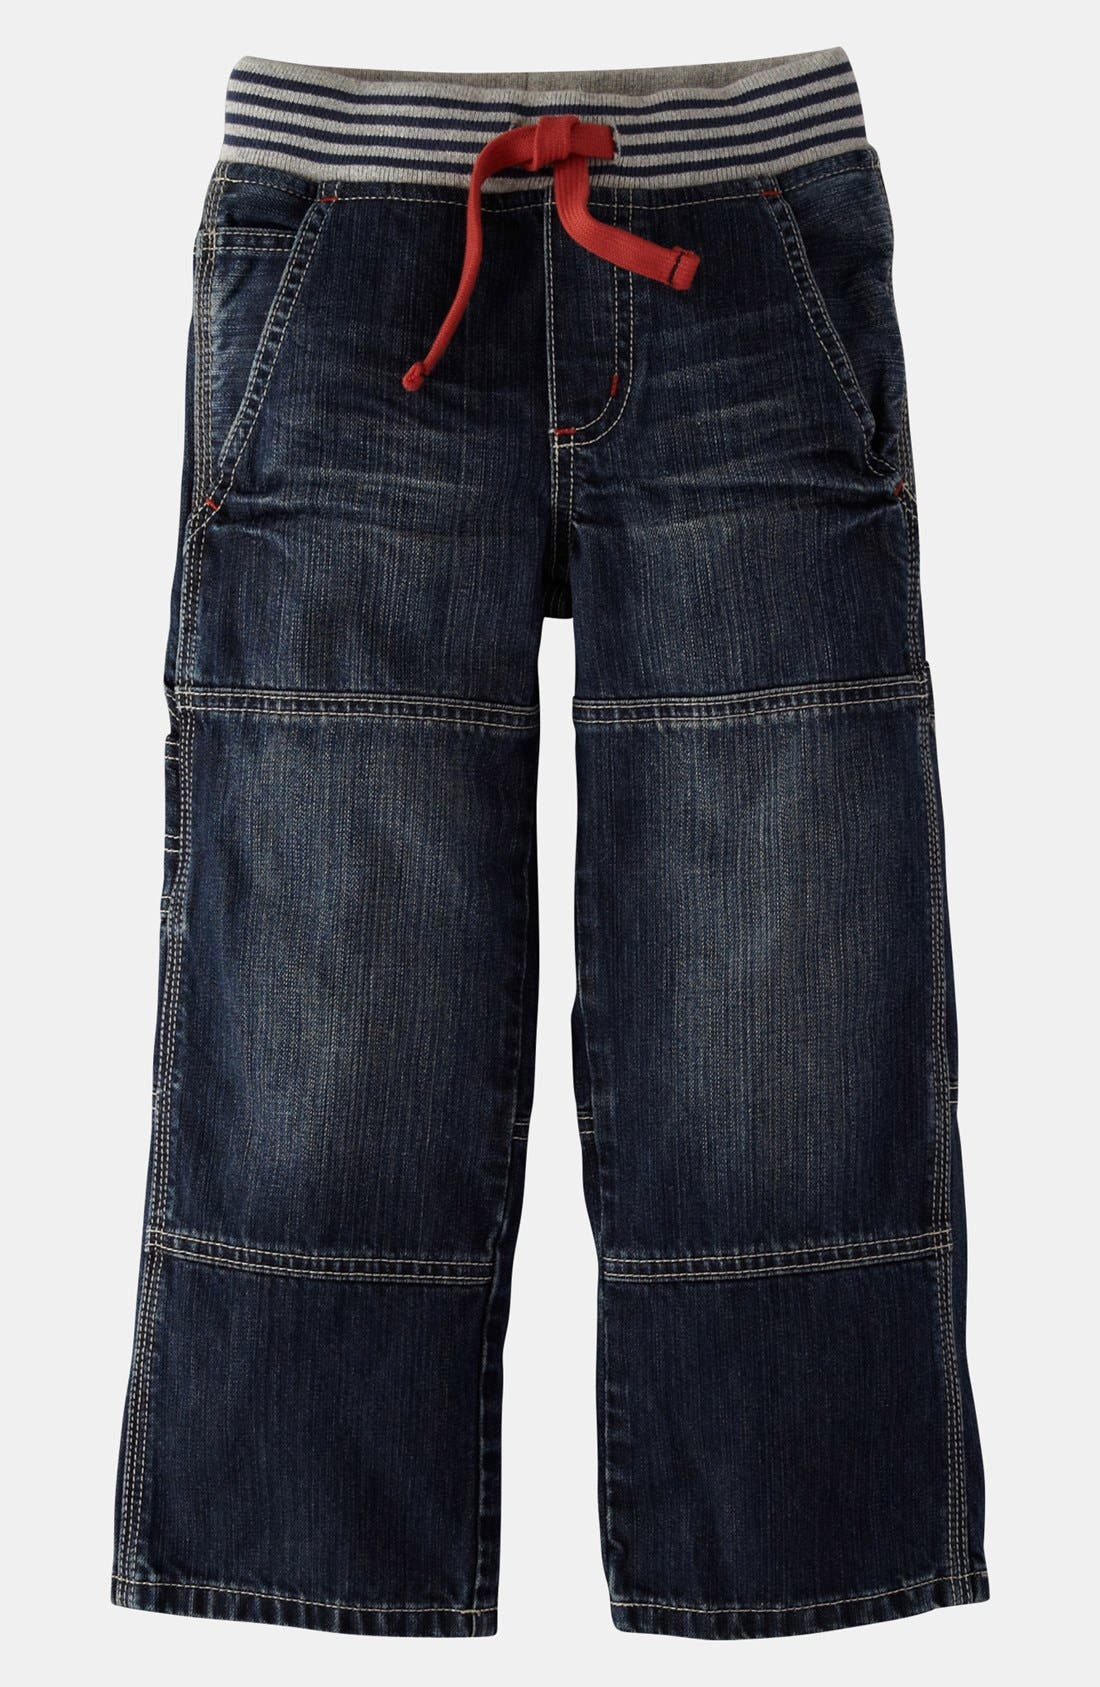 Alternate Image 1 Selected - Mini Boden Ribbed Waist Carpenter Pants (Toddler Boys)